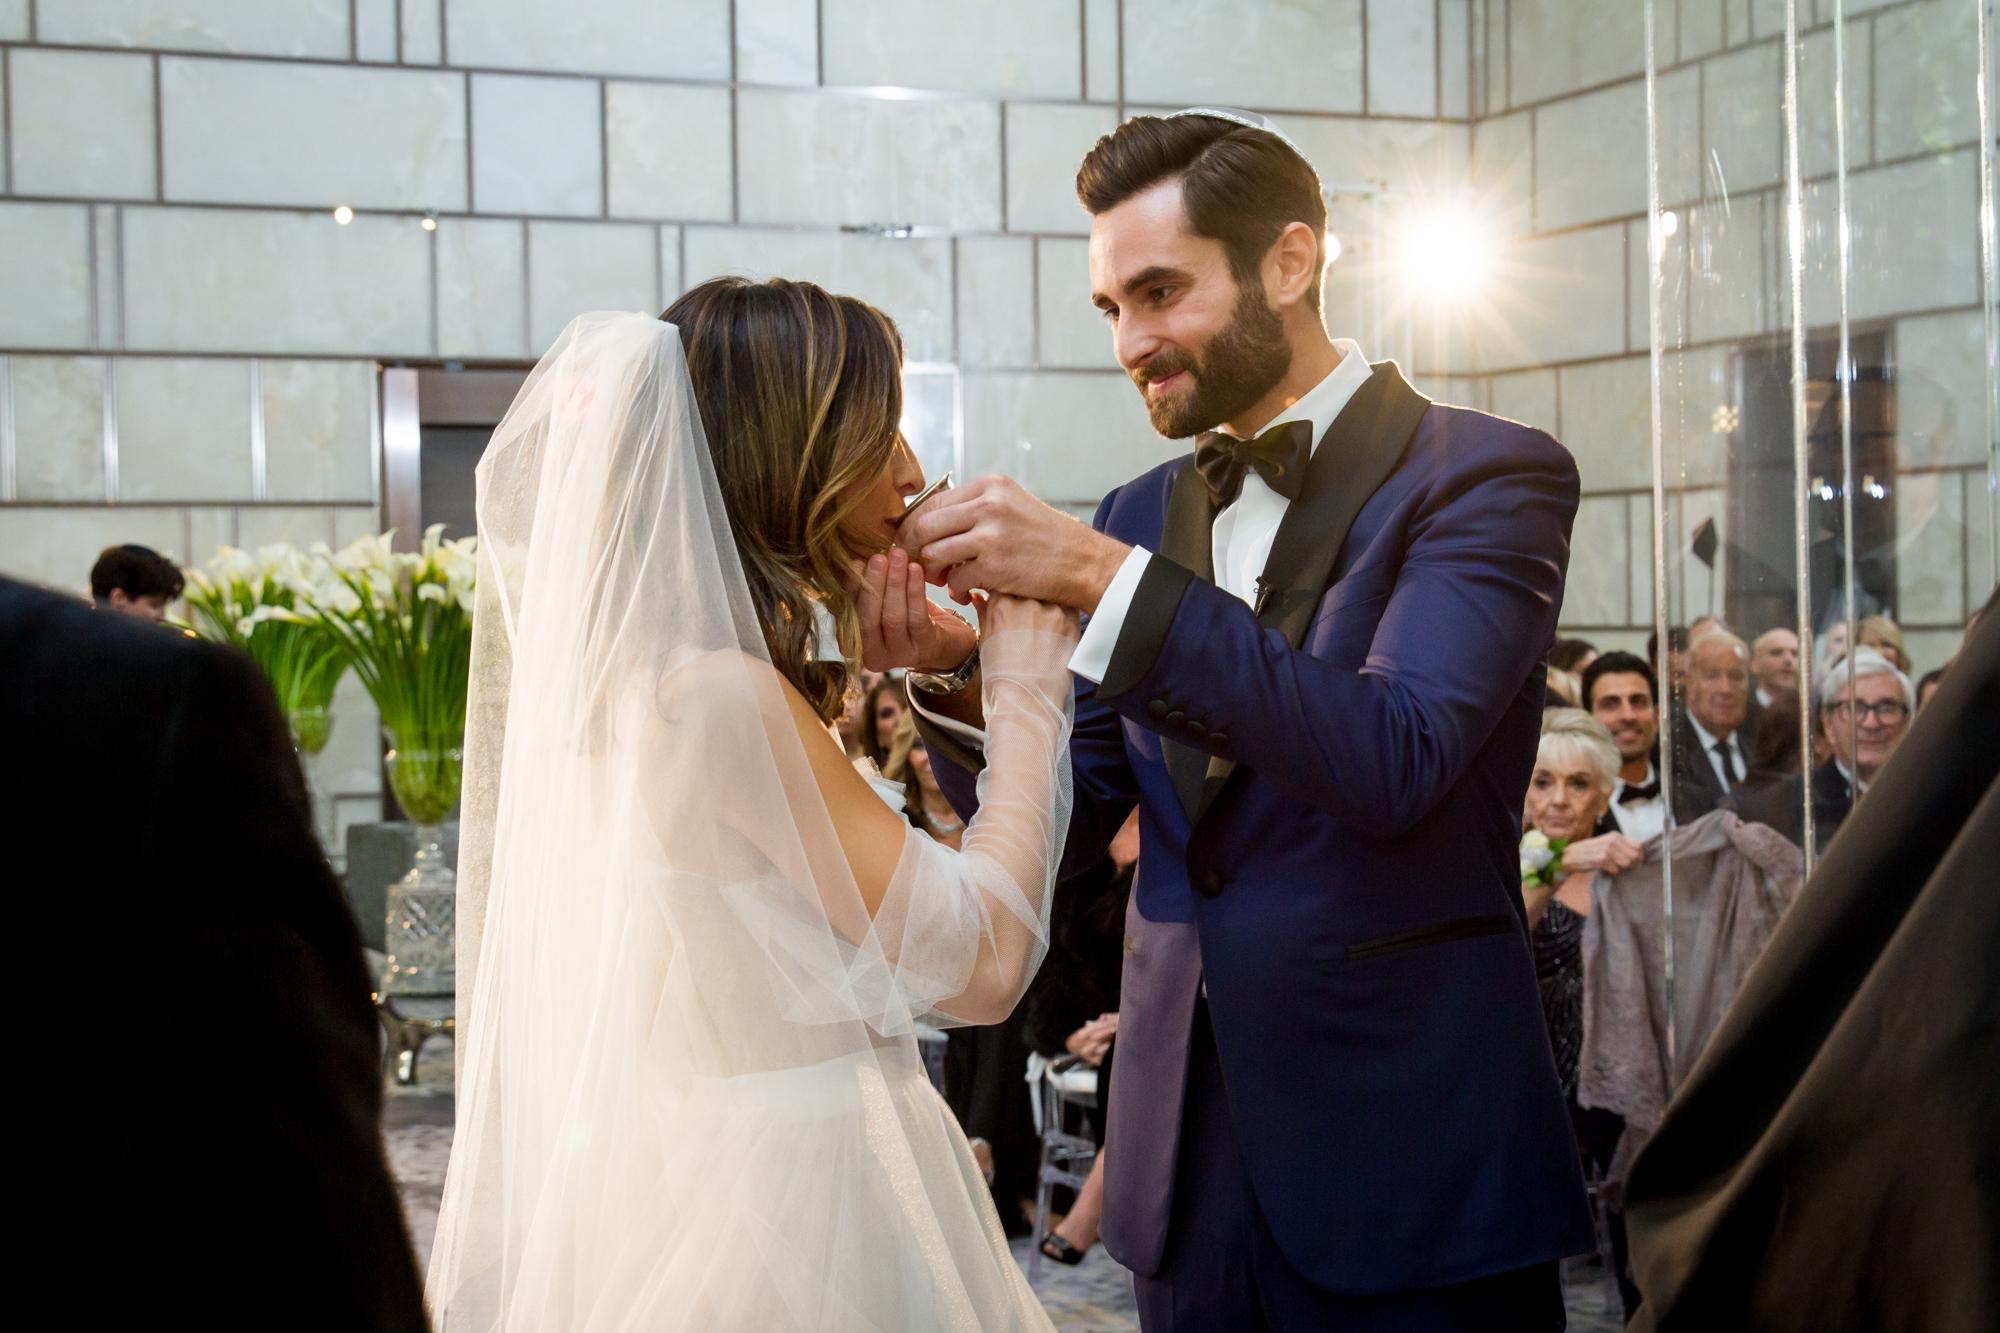 terri-diamond-photography-wedding_2762.jpg